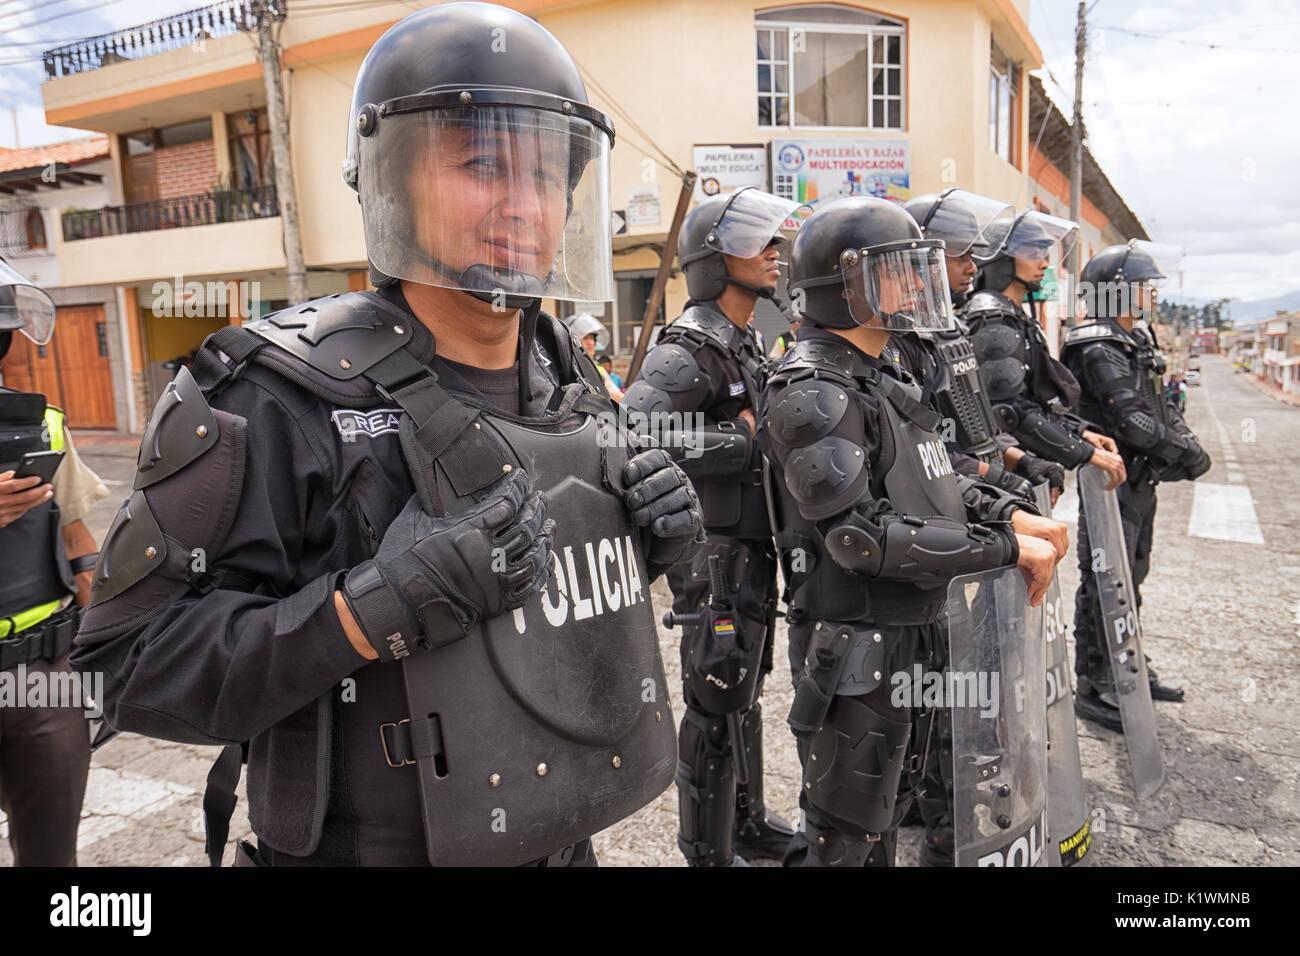 riot police in action in Cotacachi Imbabura Ecuador during inti raymi parade at summer solstice - Stock Image